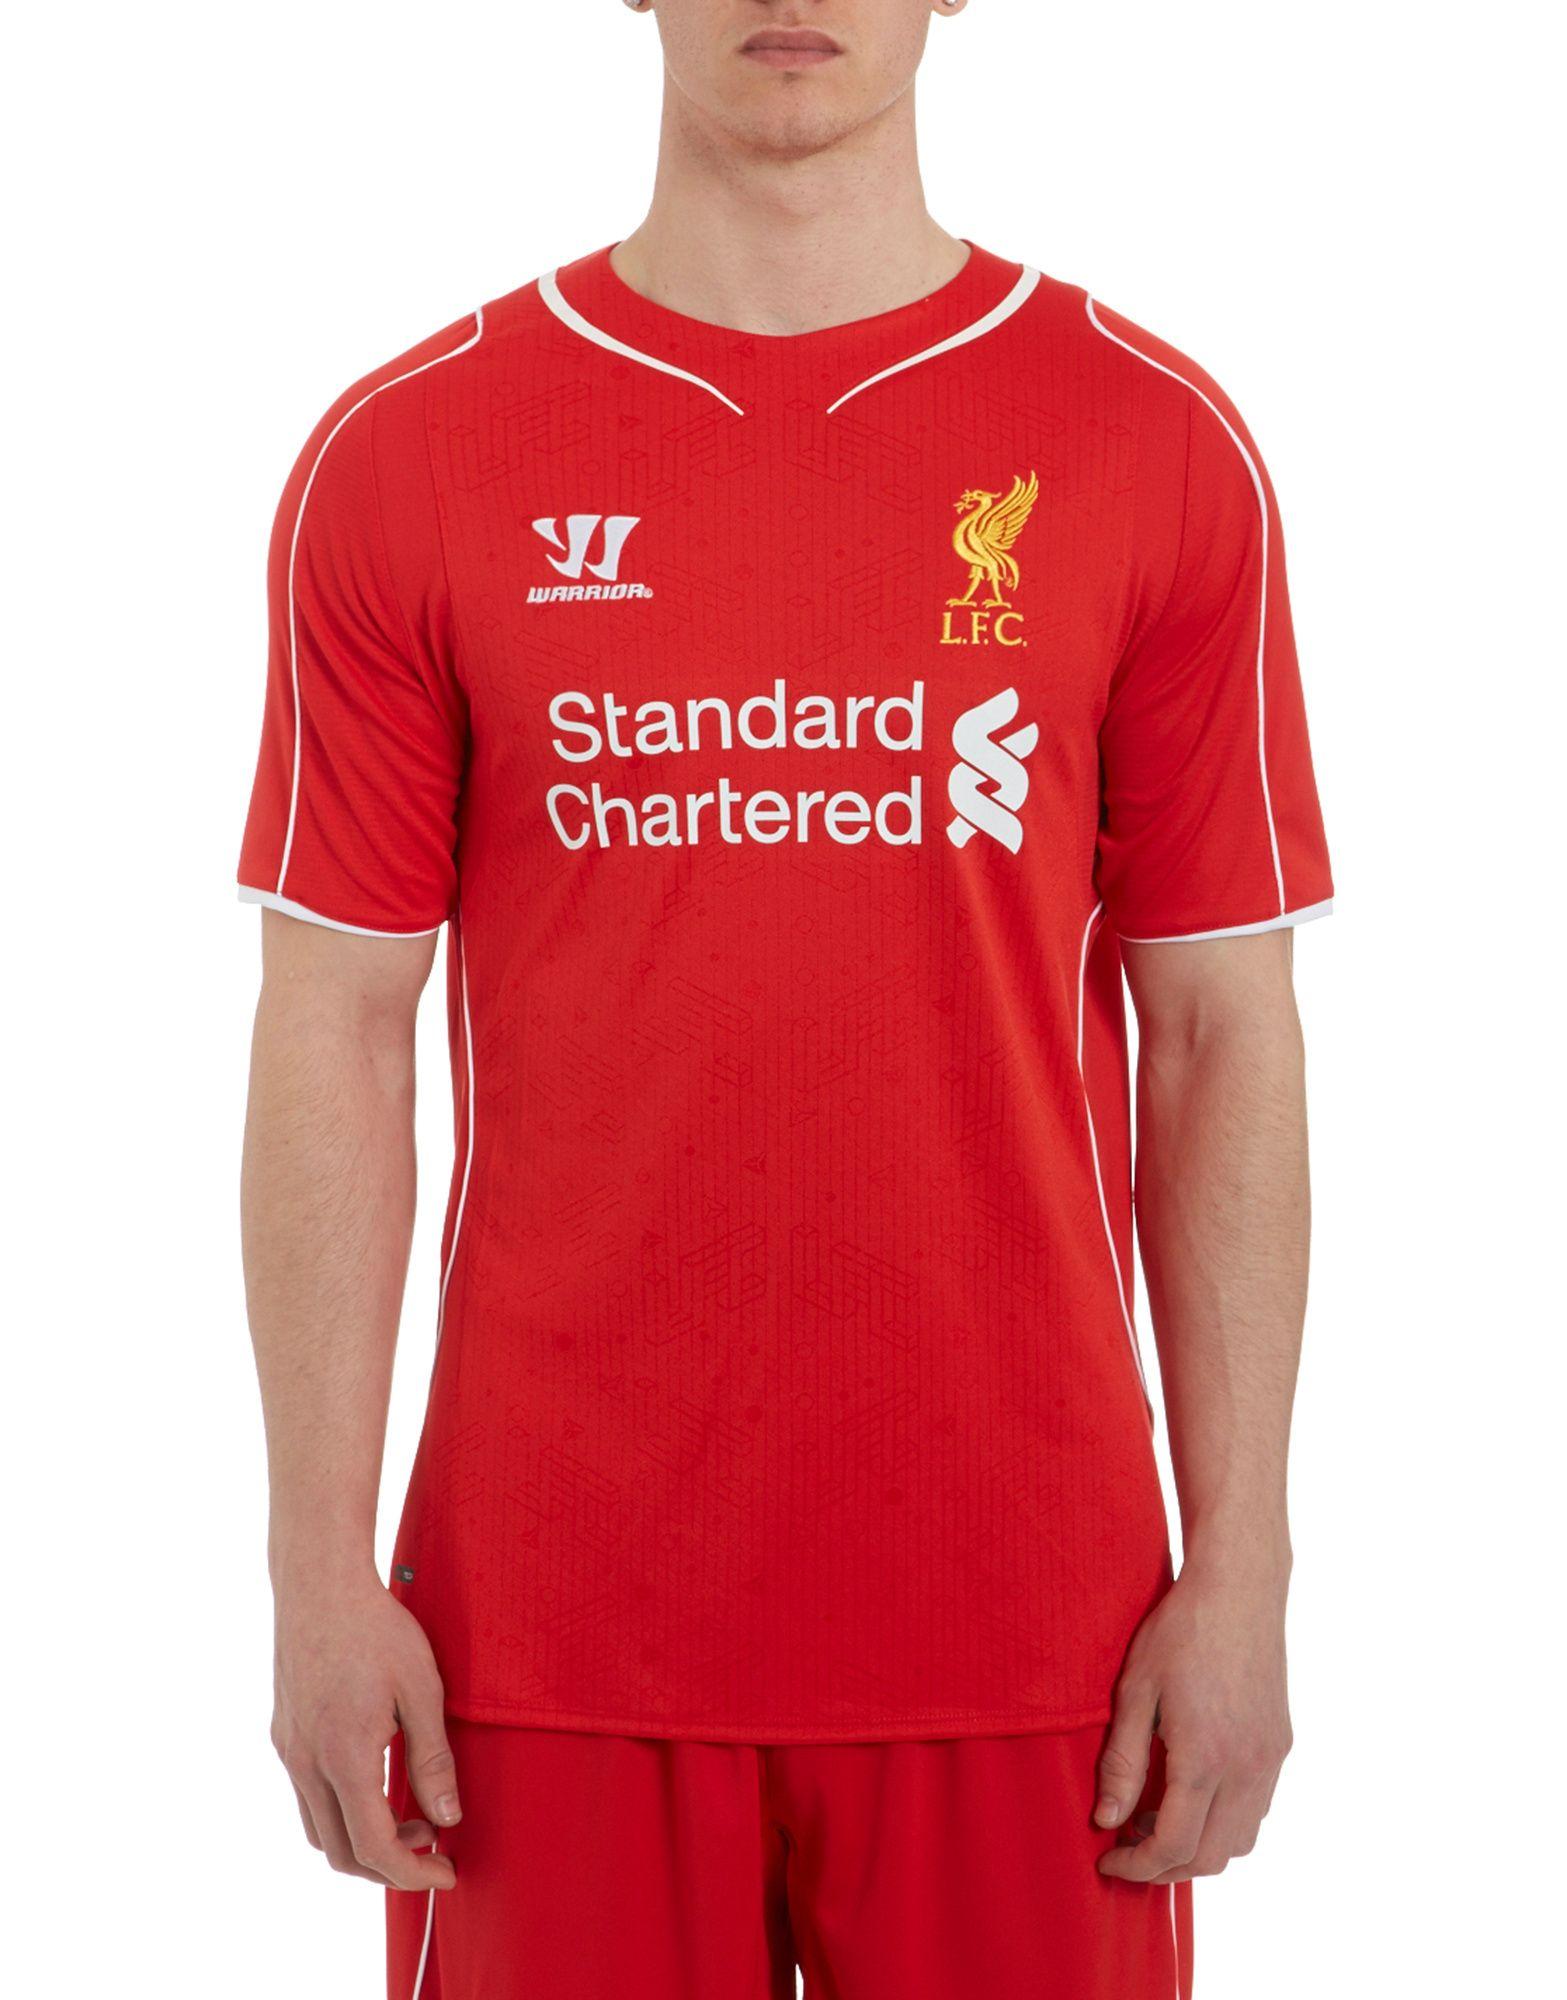 Warrior Sports Liverpool 2014 Home Shirt